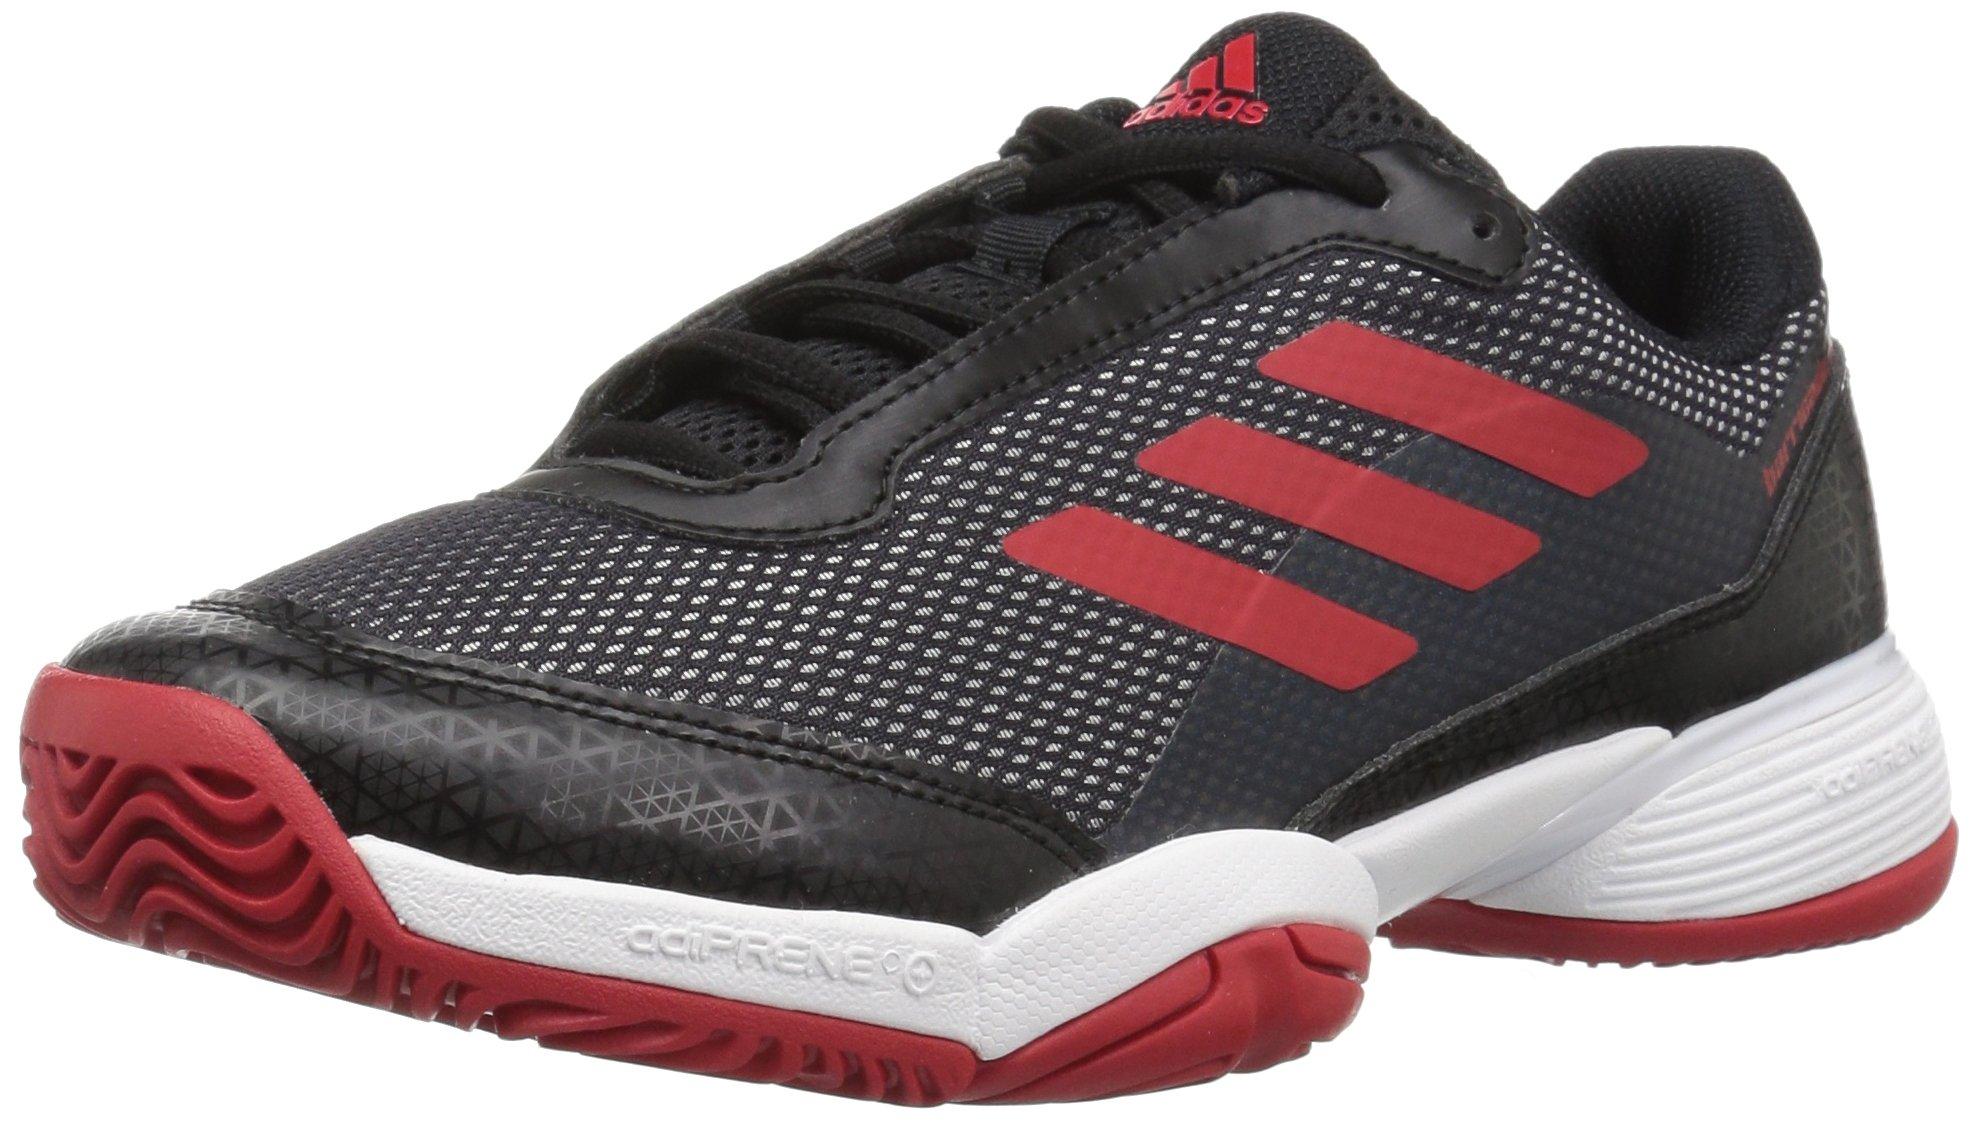 adidas Unisex Barricade Club Tennis Shoe, Black/Scarlet/White, 6 M US Big Kid